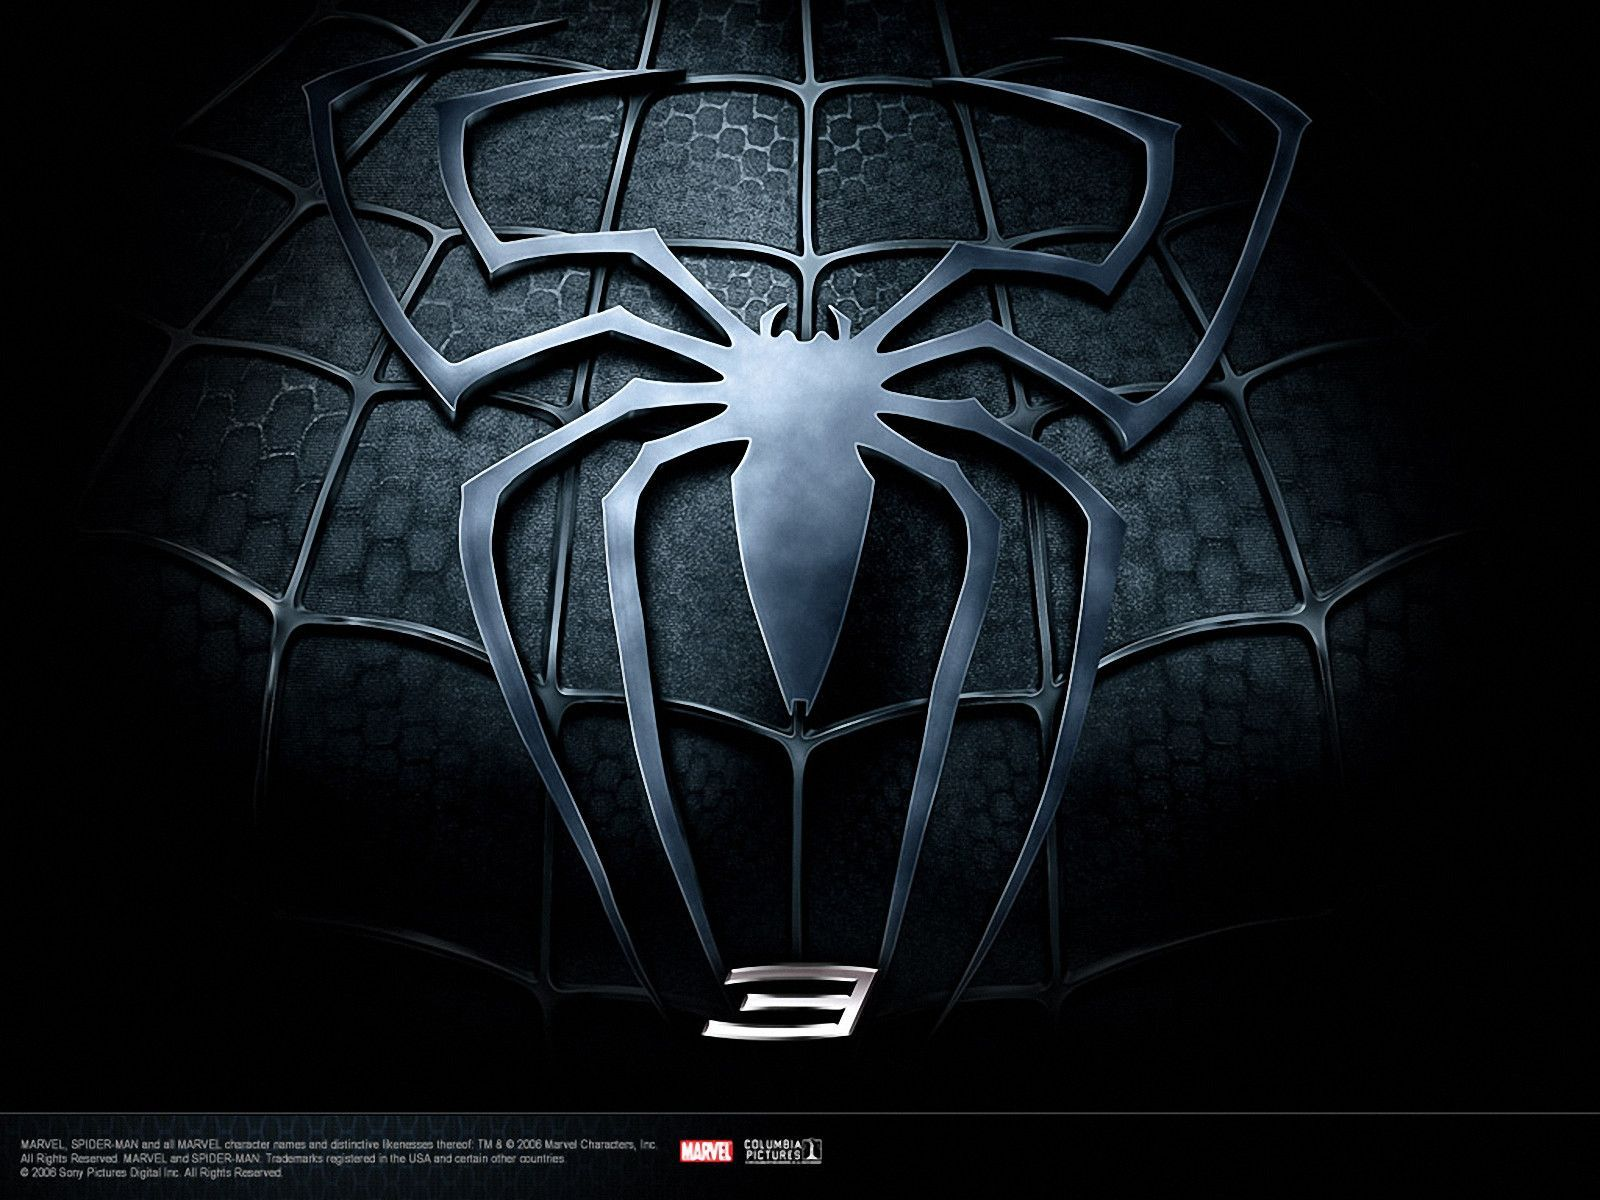 Hd wallpaper spiderman - Spiderman Wallpapers Hd Wallpaper Cave